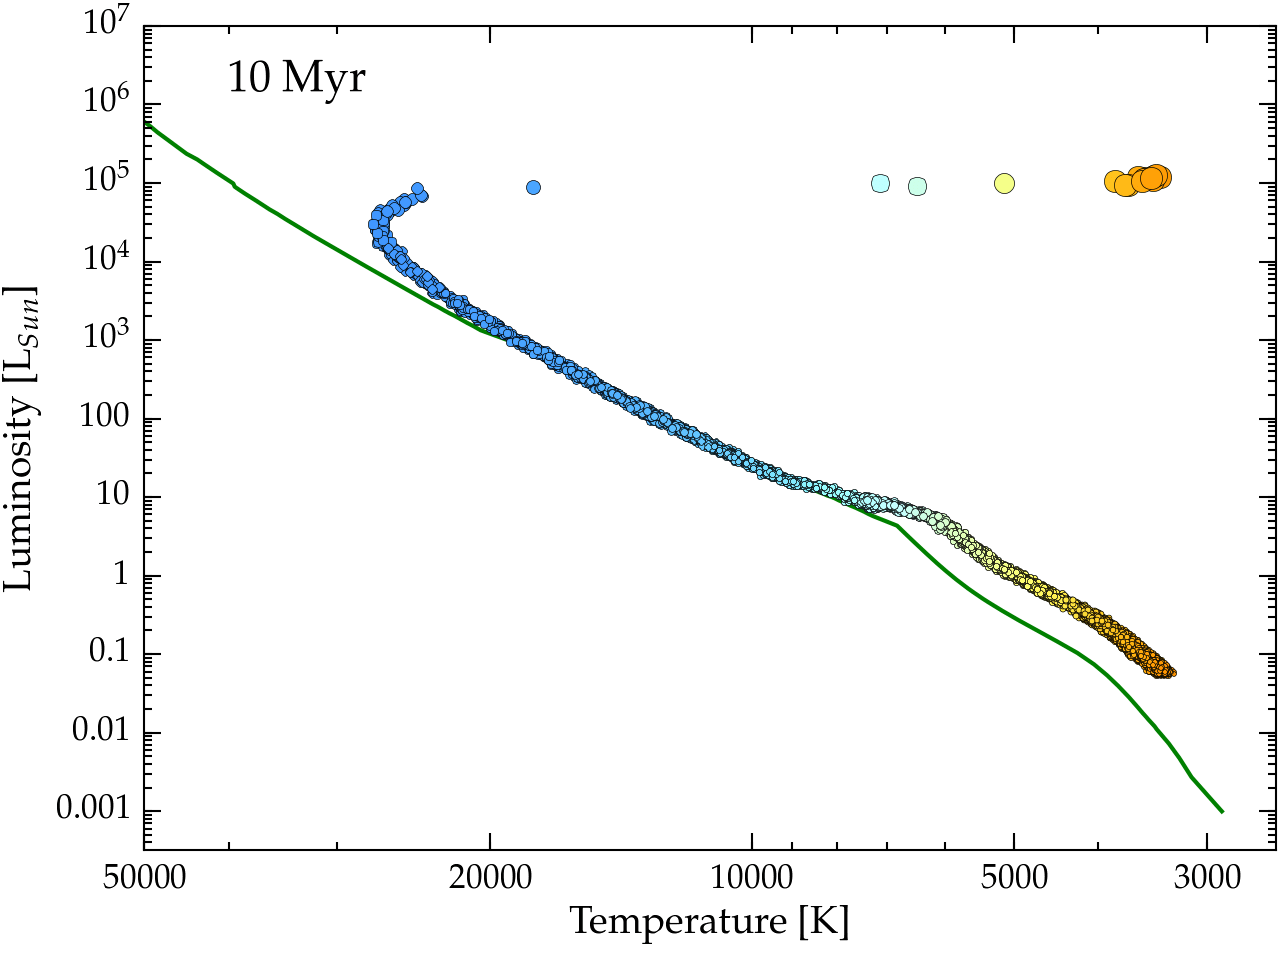 hight resolution of  h r diagram t 10 myr